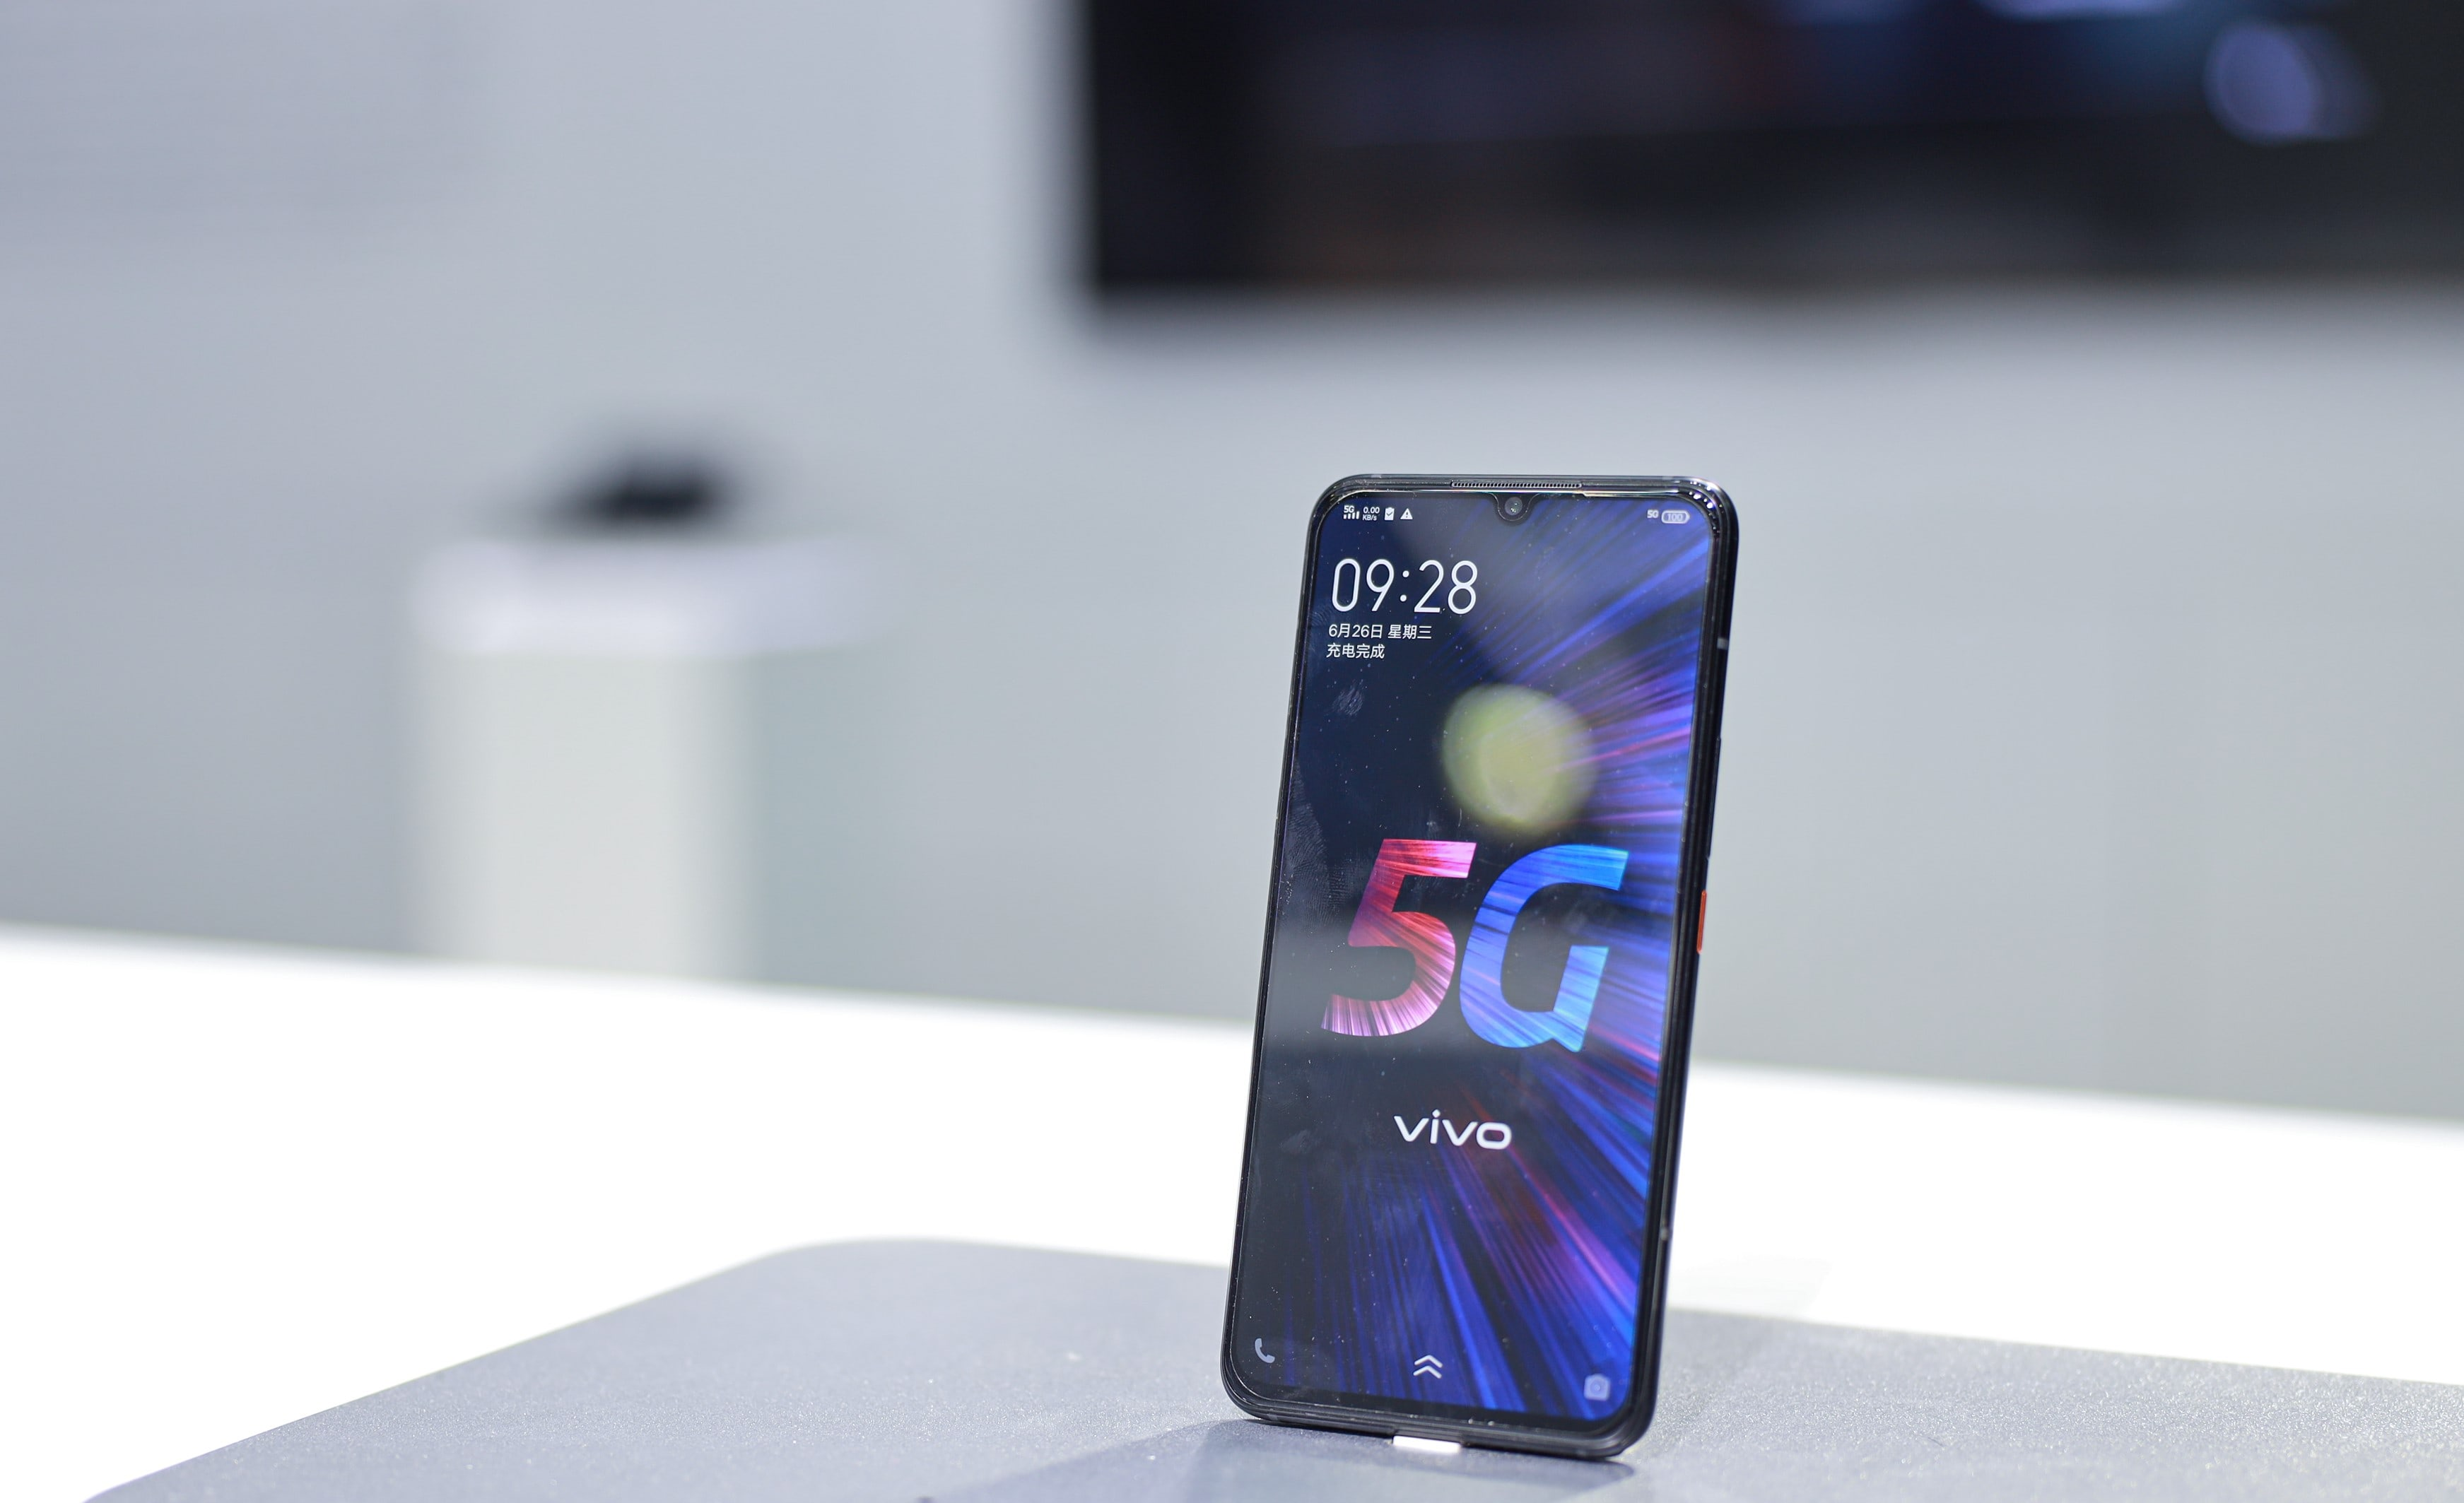 Vivo_MWC Shanghai_5G Smartphone-min